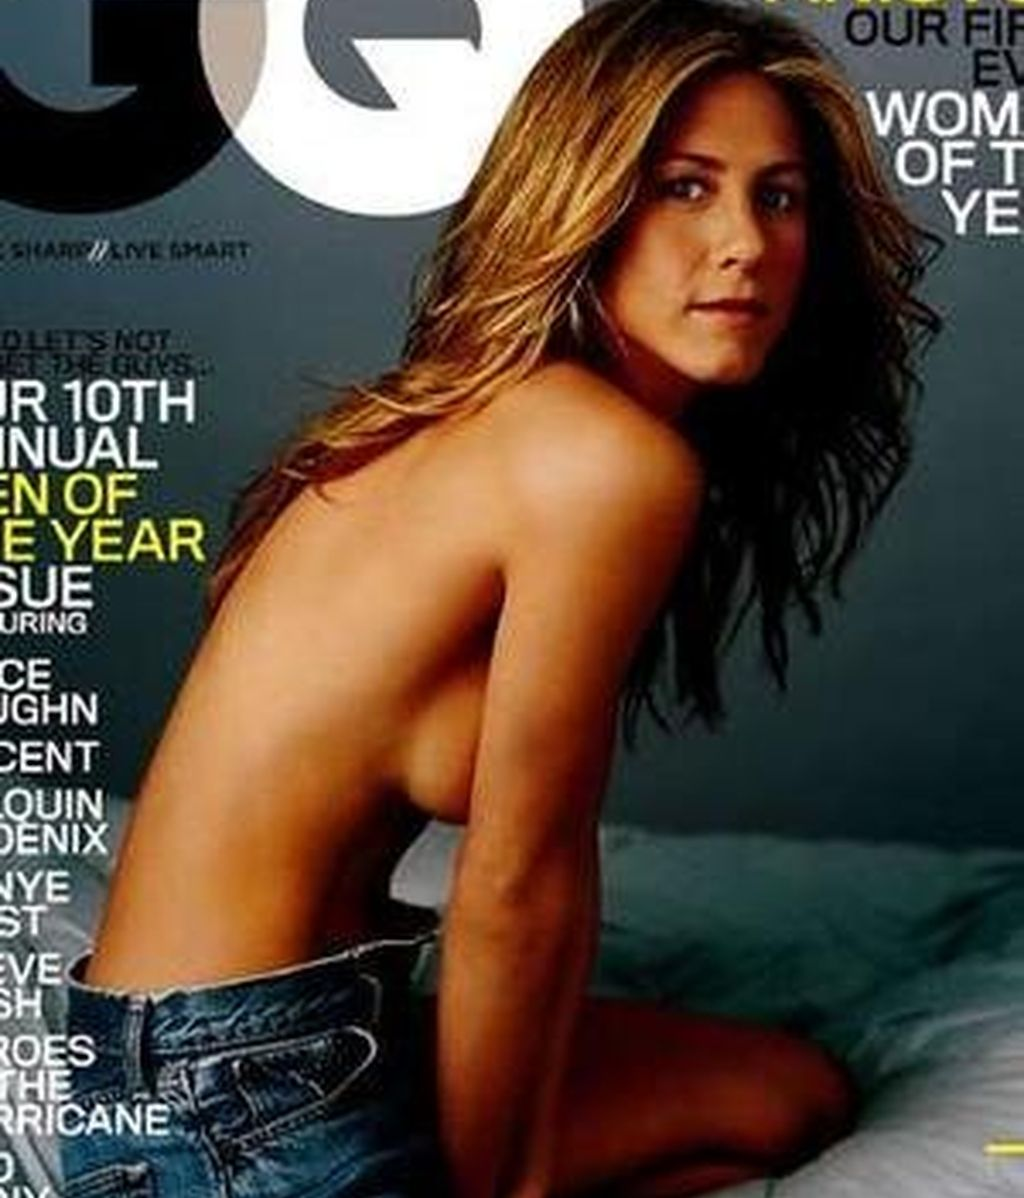 Jennifer vuelve a posar en topless sin enseñar nada